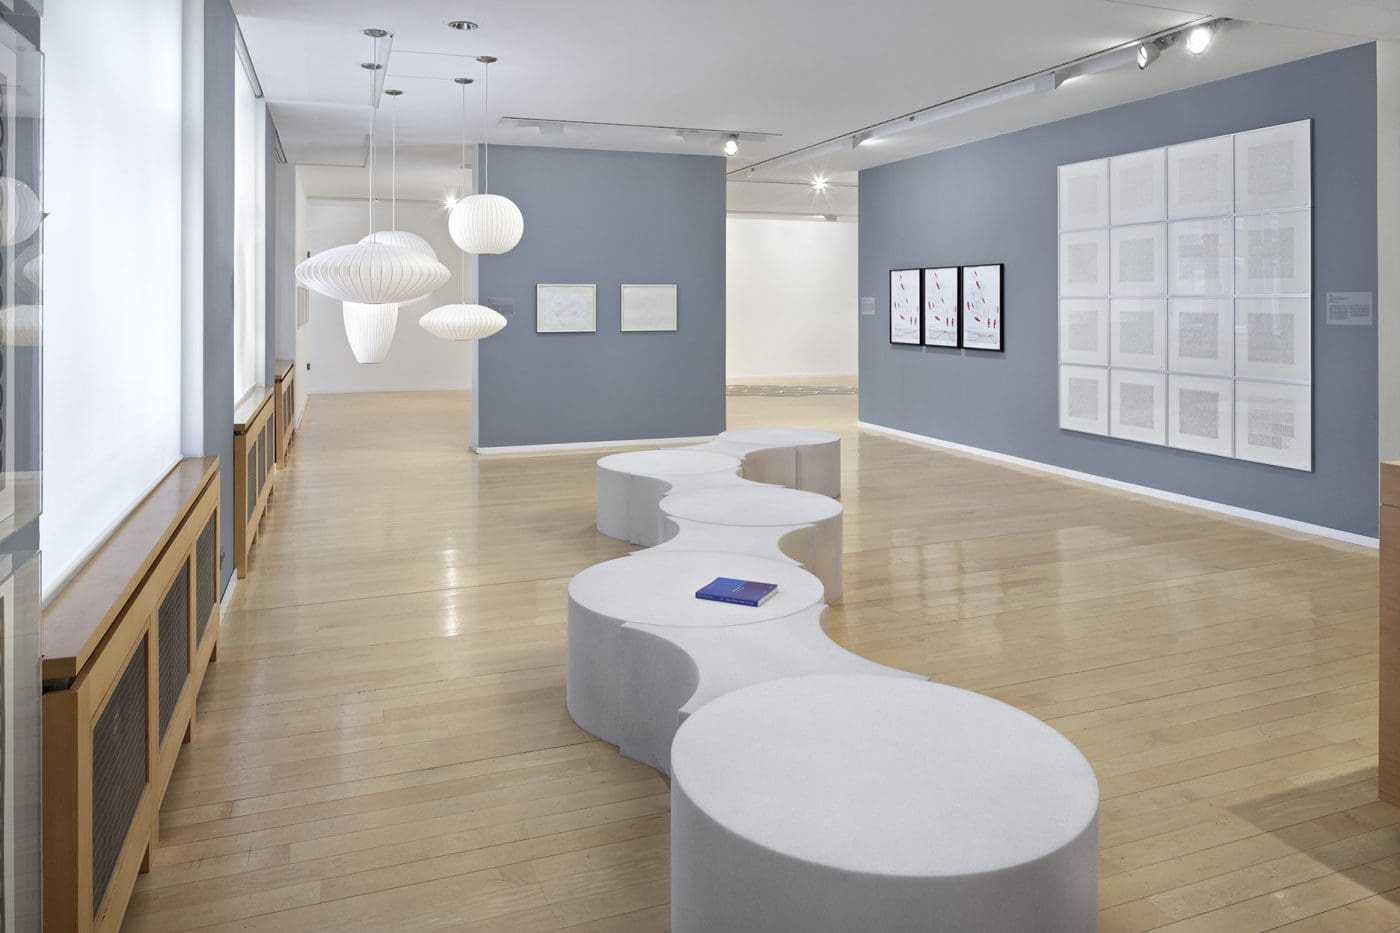 Daimler modern Art Collection